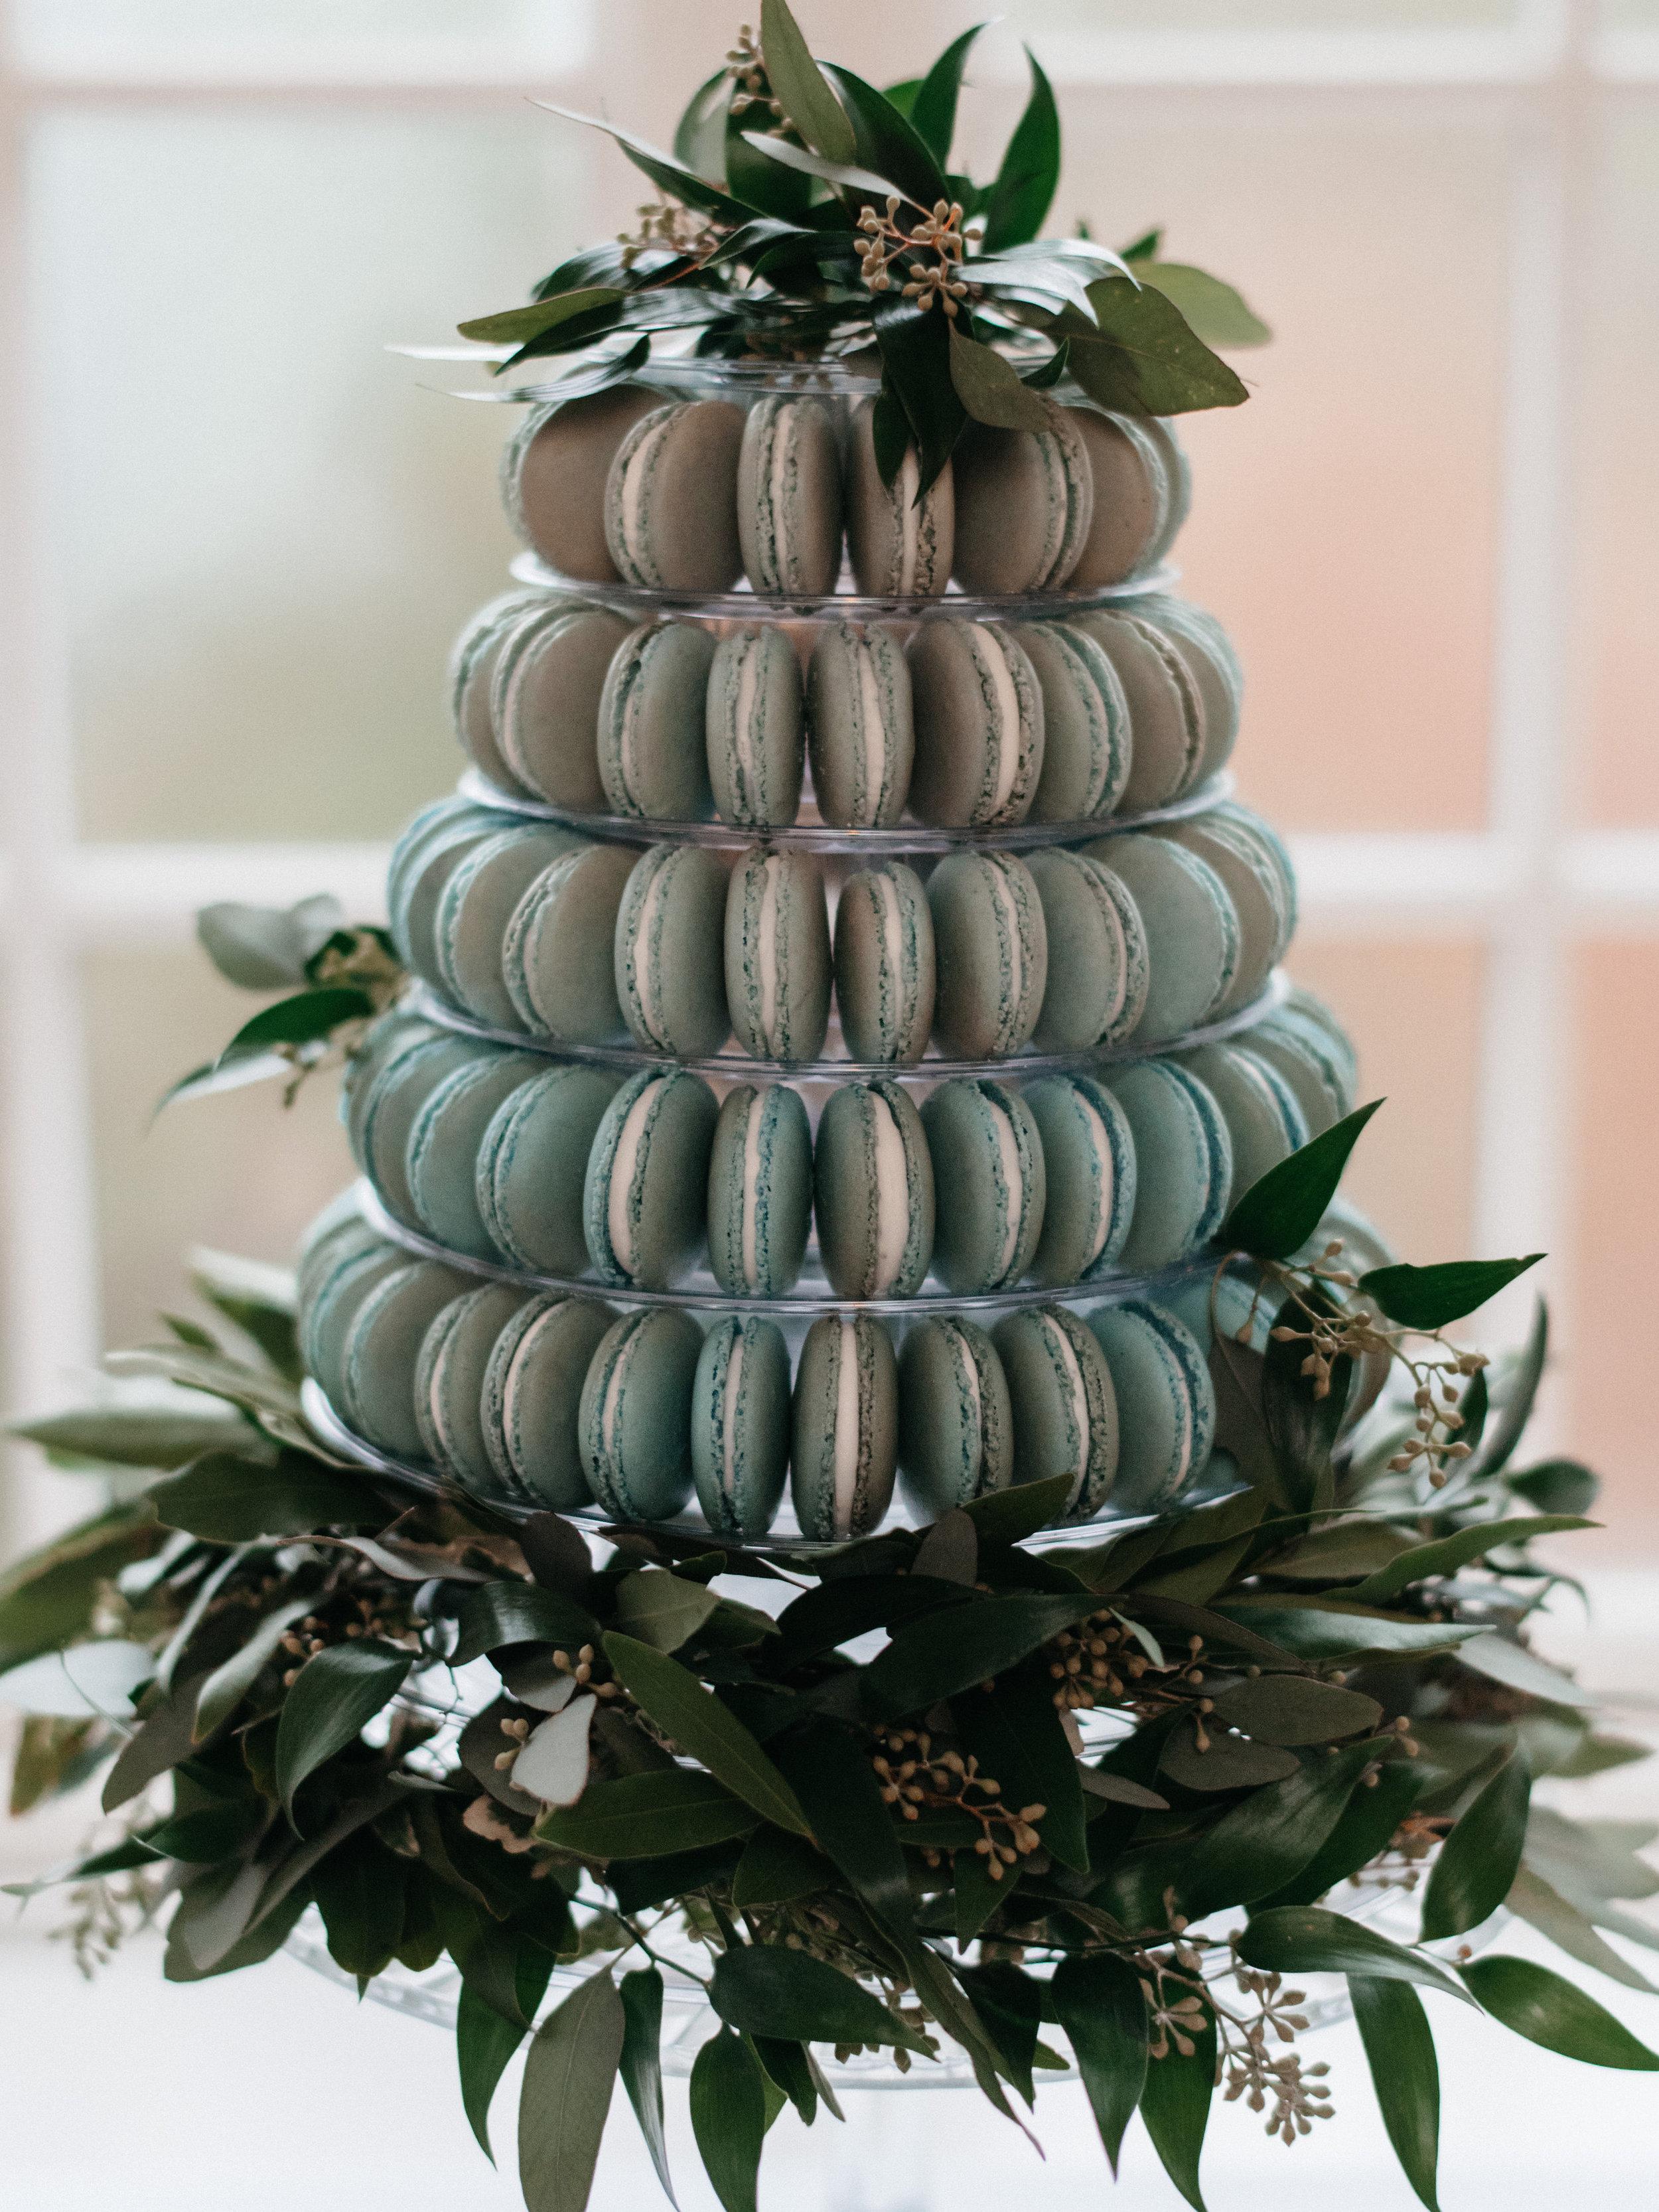 macaron tower blue